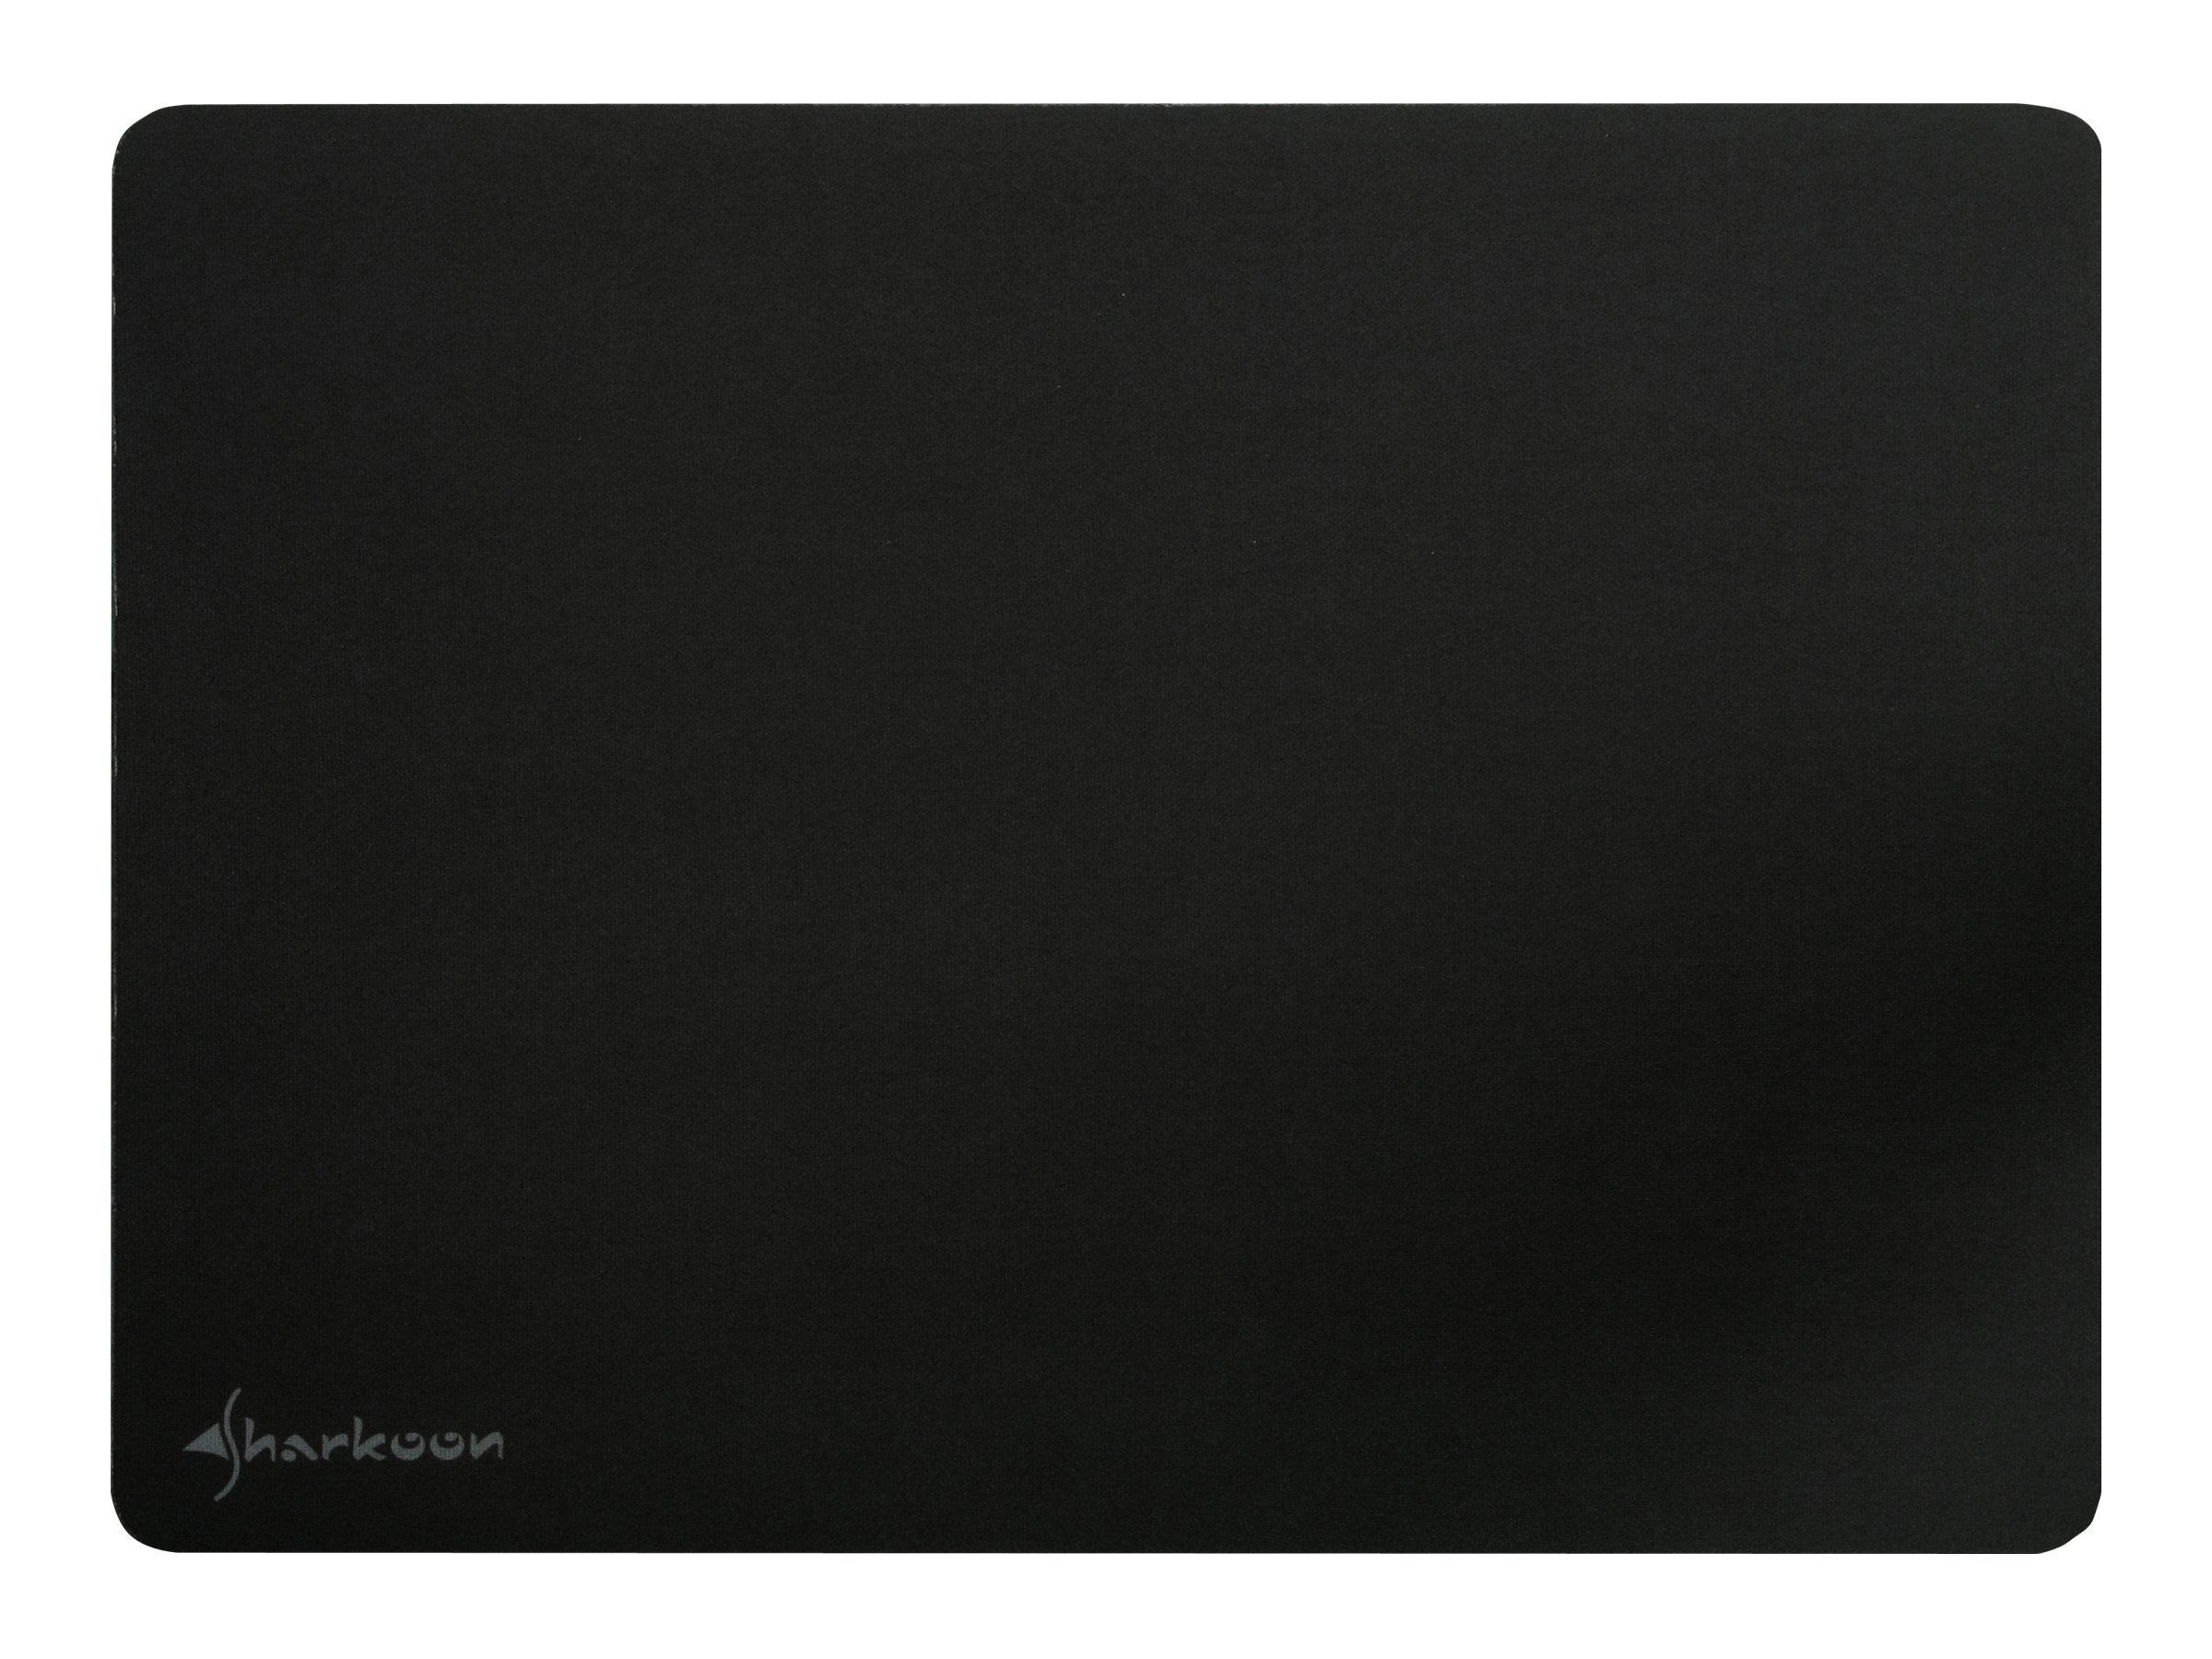 Sharkoon 1337 Gaming Mat XL - Mauspad - Schwarz